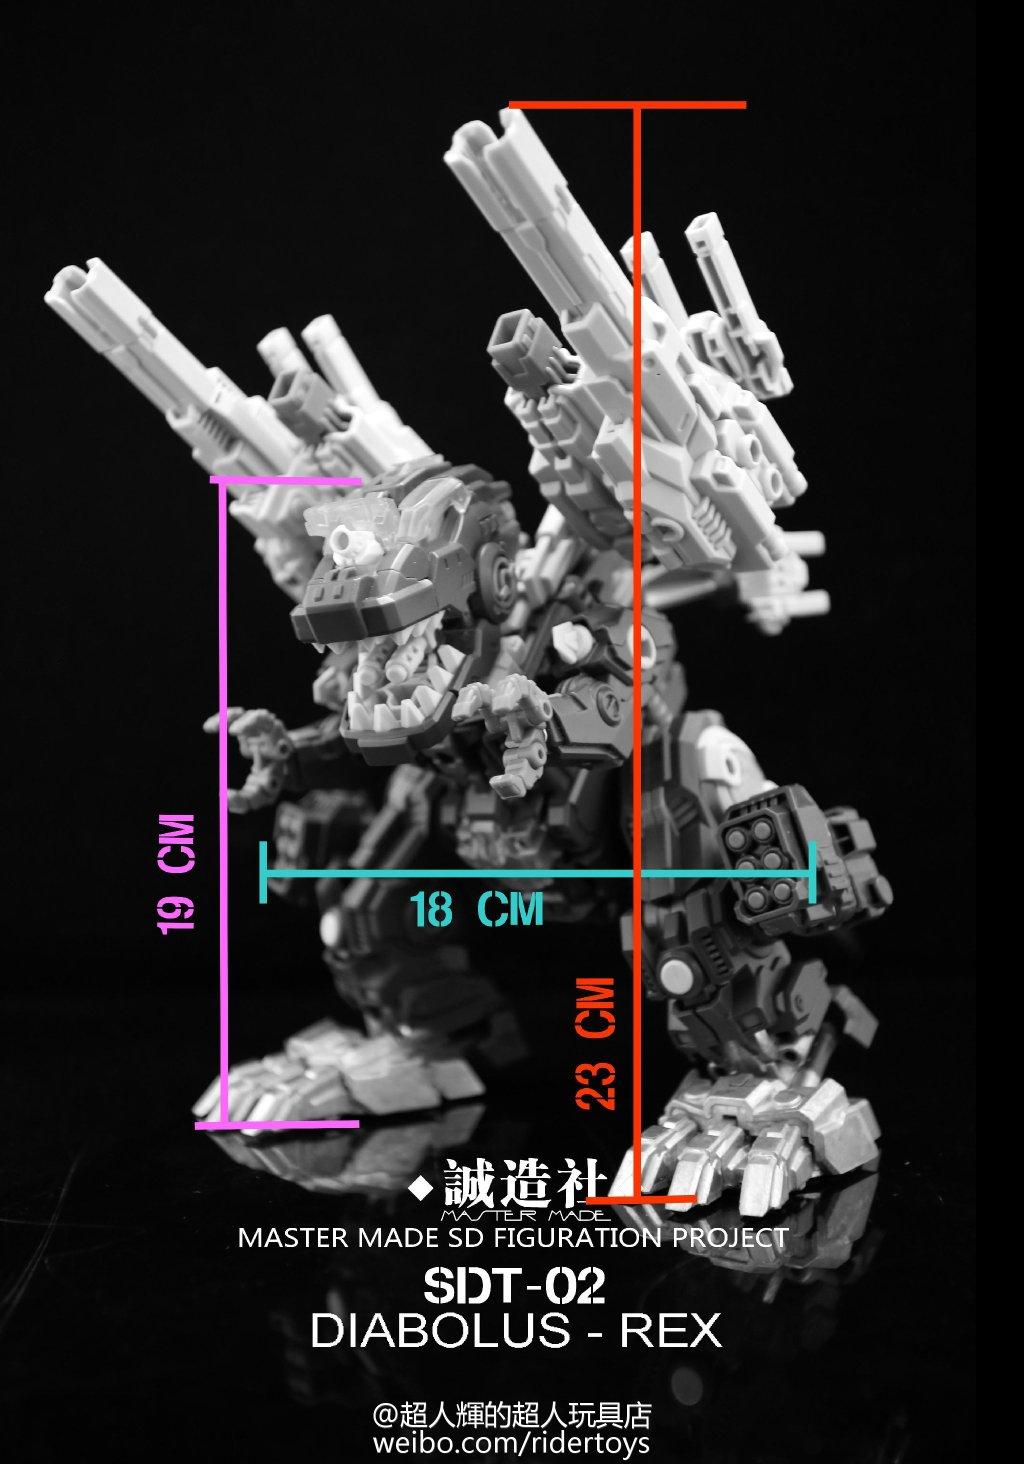 Produit Tiers - Figurine miniature déformé (transformable) - Par: Hero Hobby + MiniPower + Master Made Diabolus-Rex-07